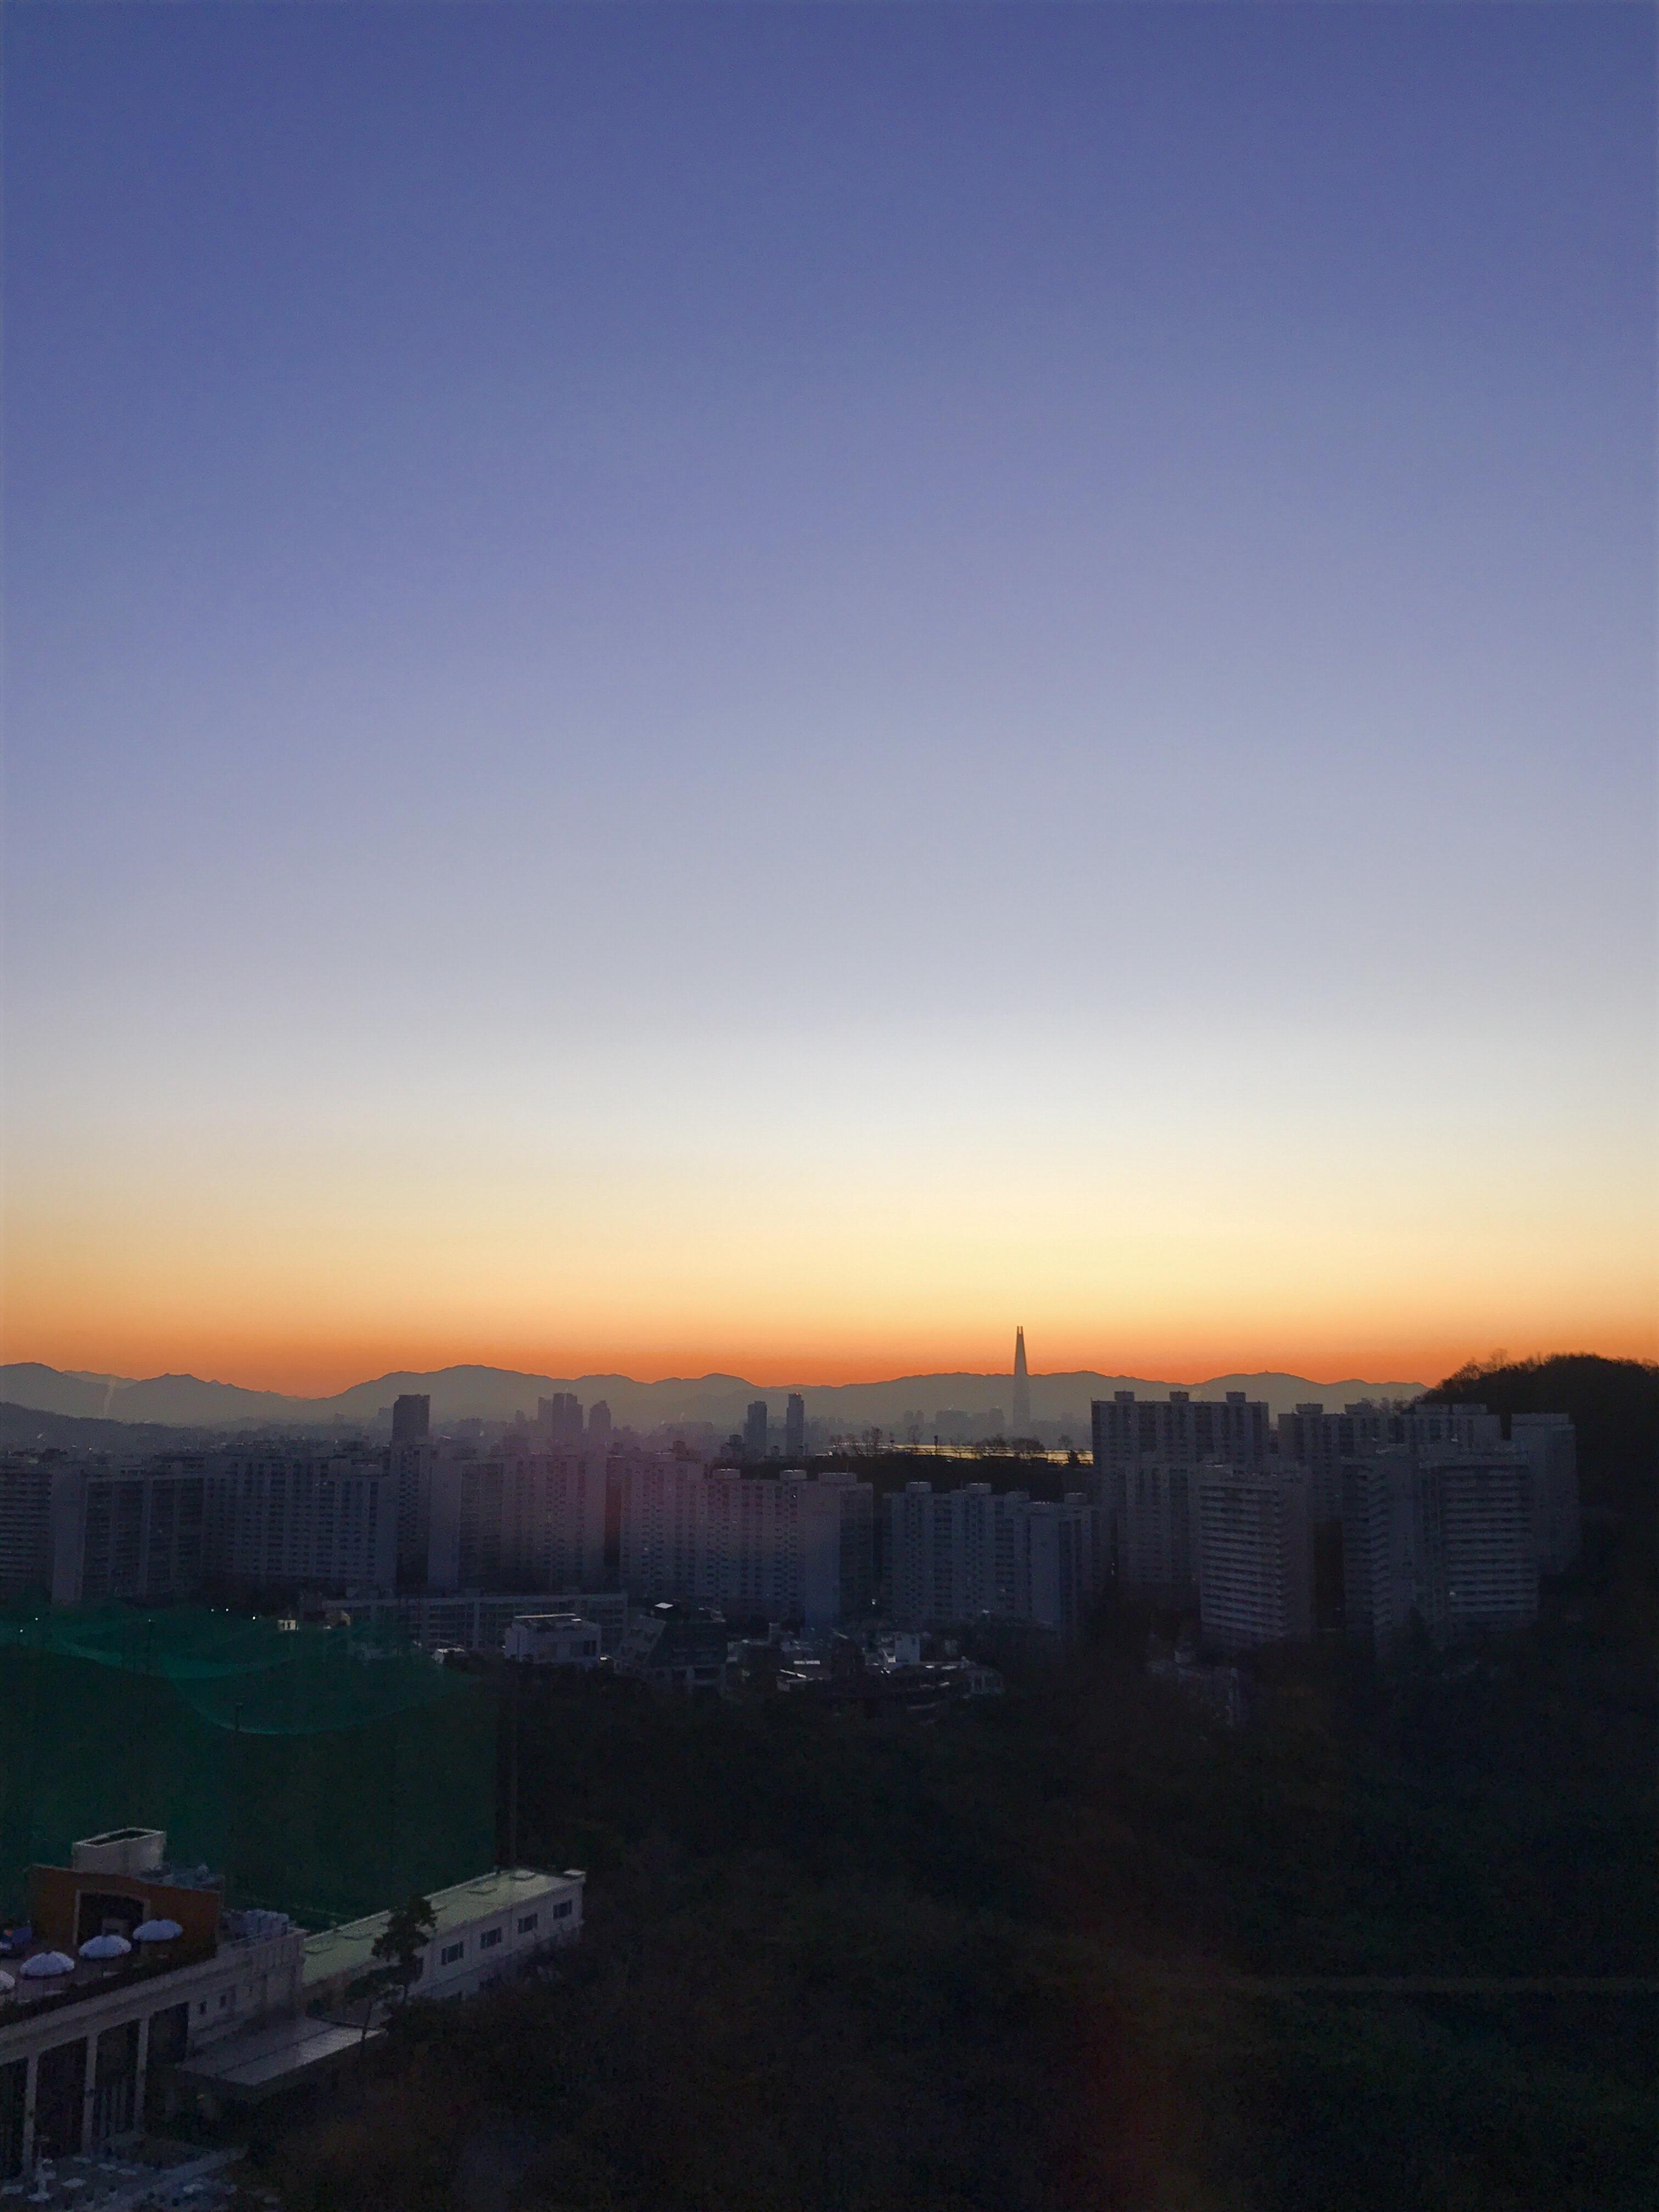 img 8007 - Banyan Tree Club & Spa Seoul - リピーターにお勧めしたい韓国ソウルのちょっと贅沢なステイ先